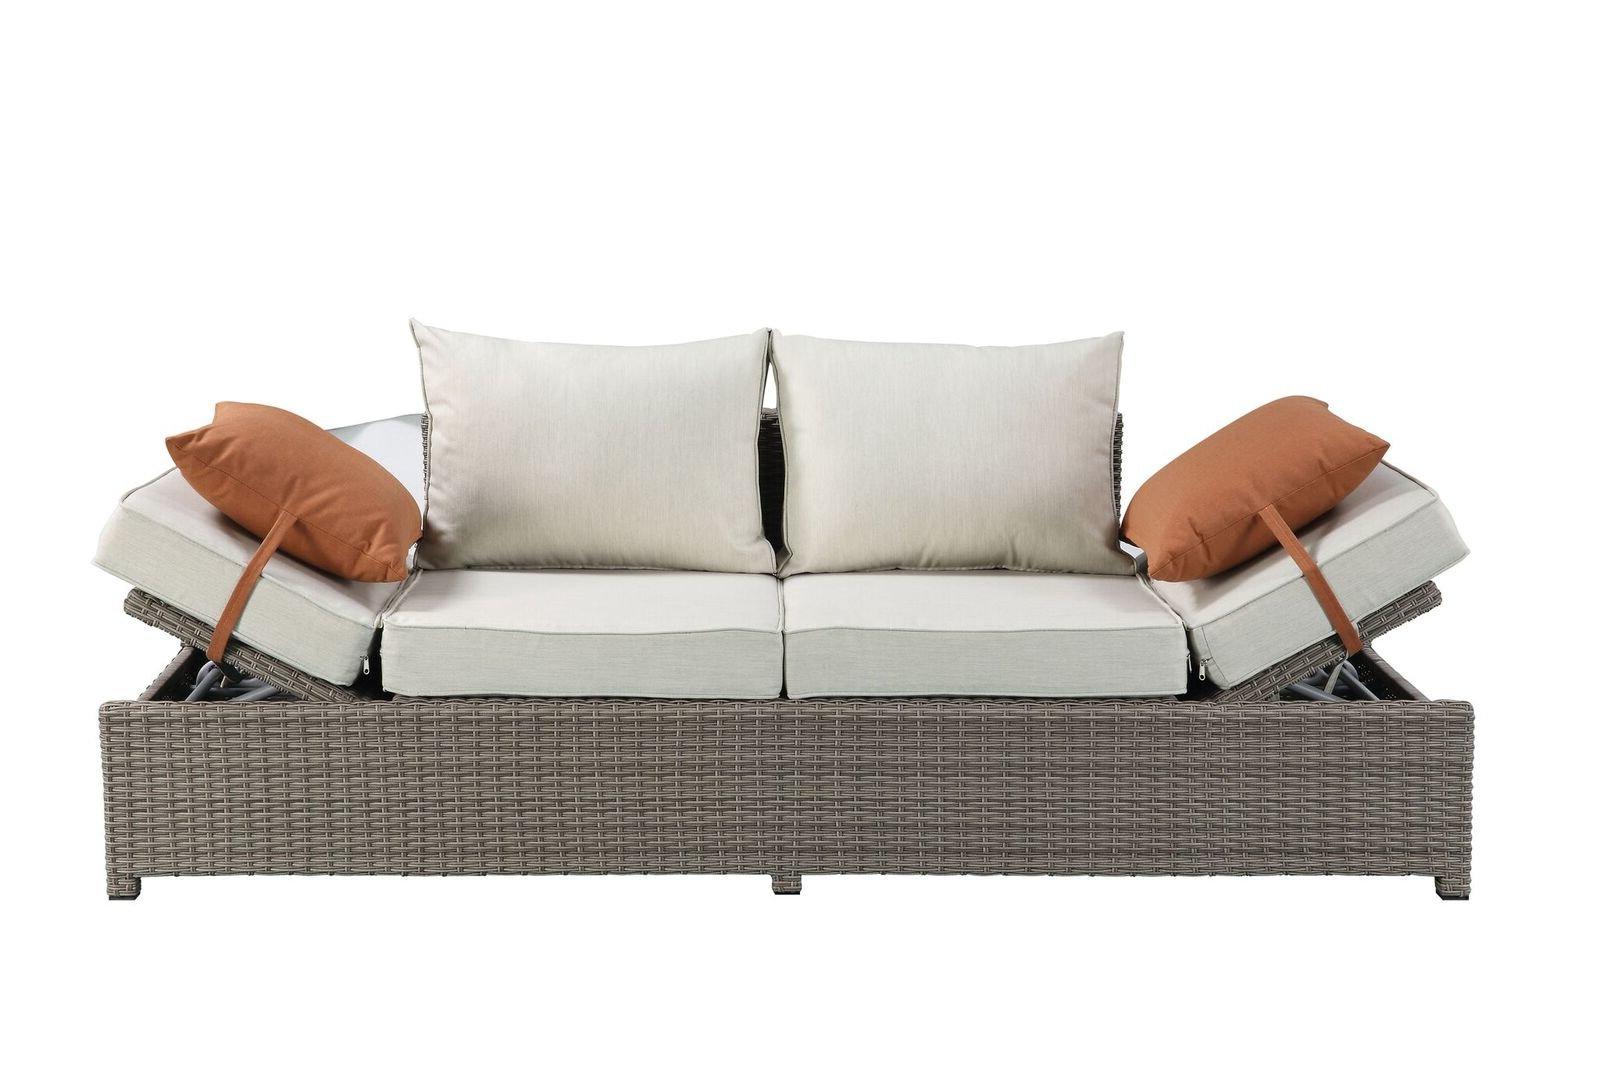 Platt Patio Sofa With Cushions Pertaining To Well Known Clifford Patio Sofas With Cushions (View 12 of 20)